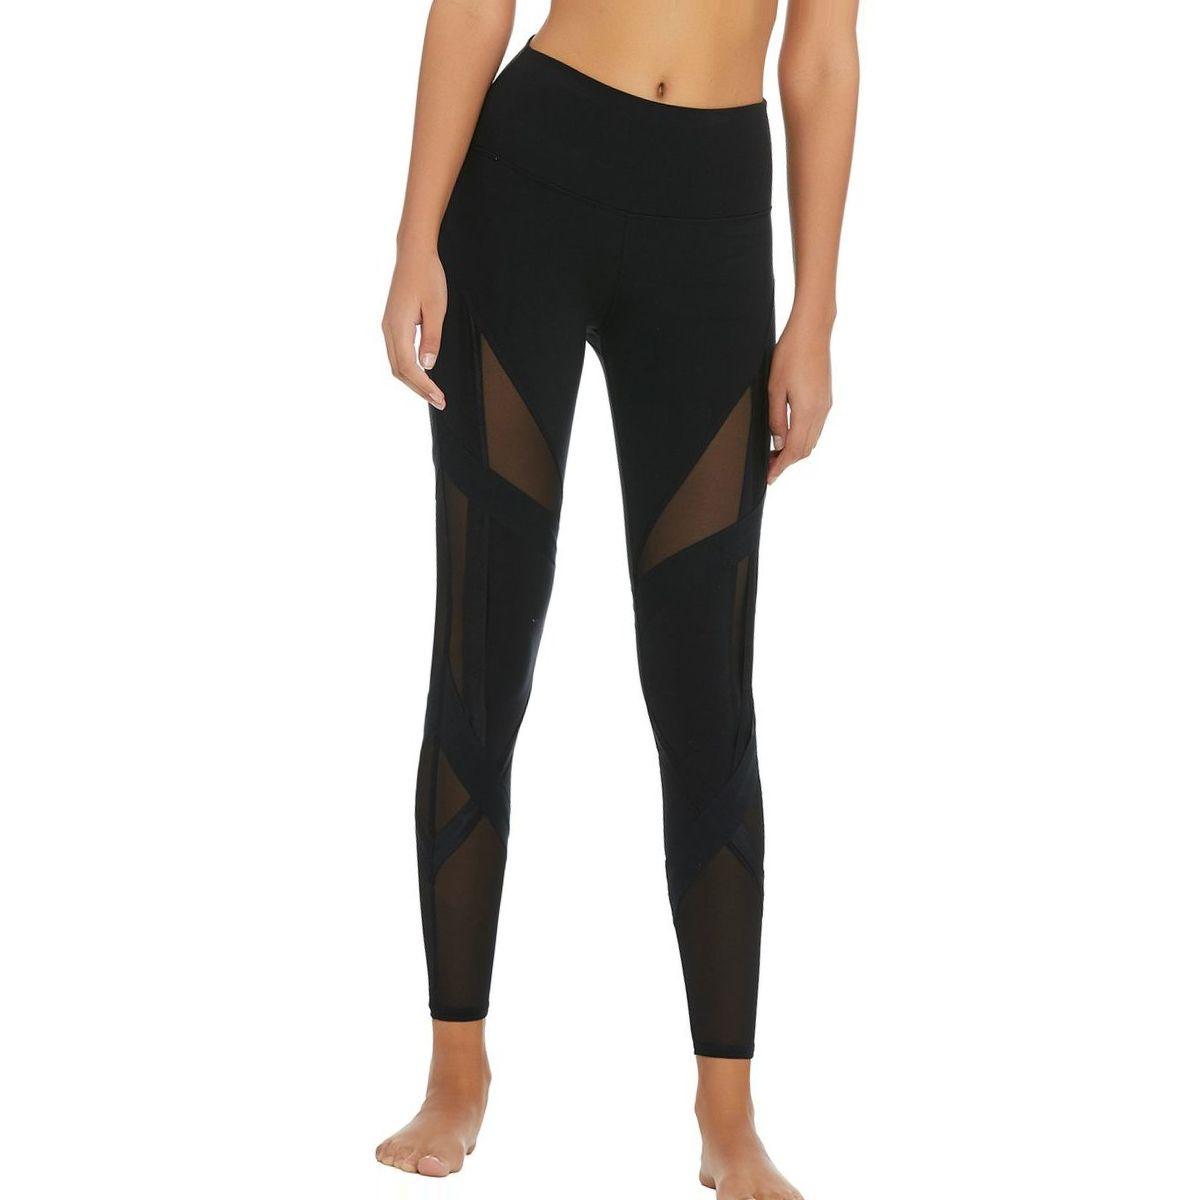 Alo Yoga High-Waist Bandage Legging - Women's